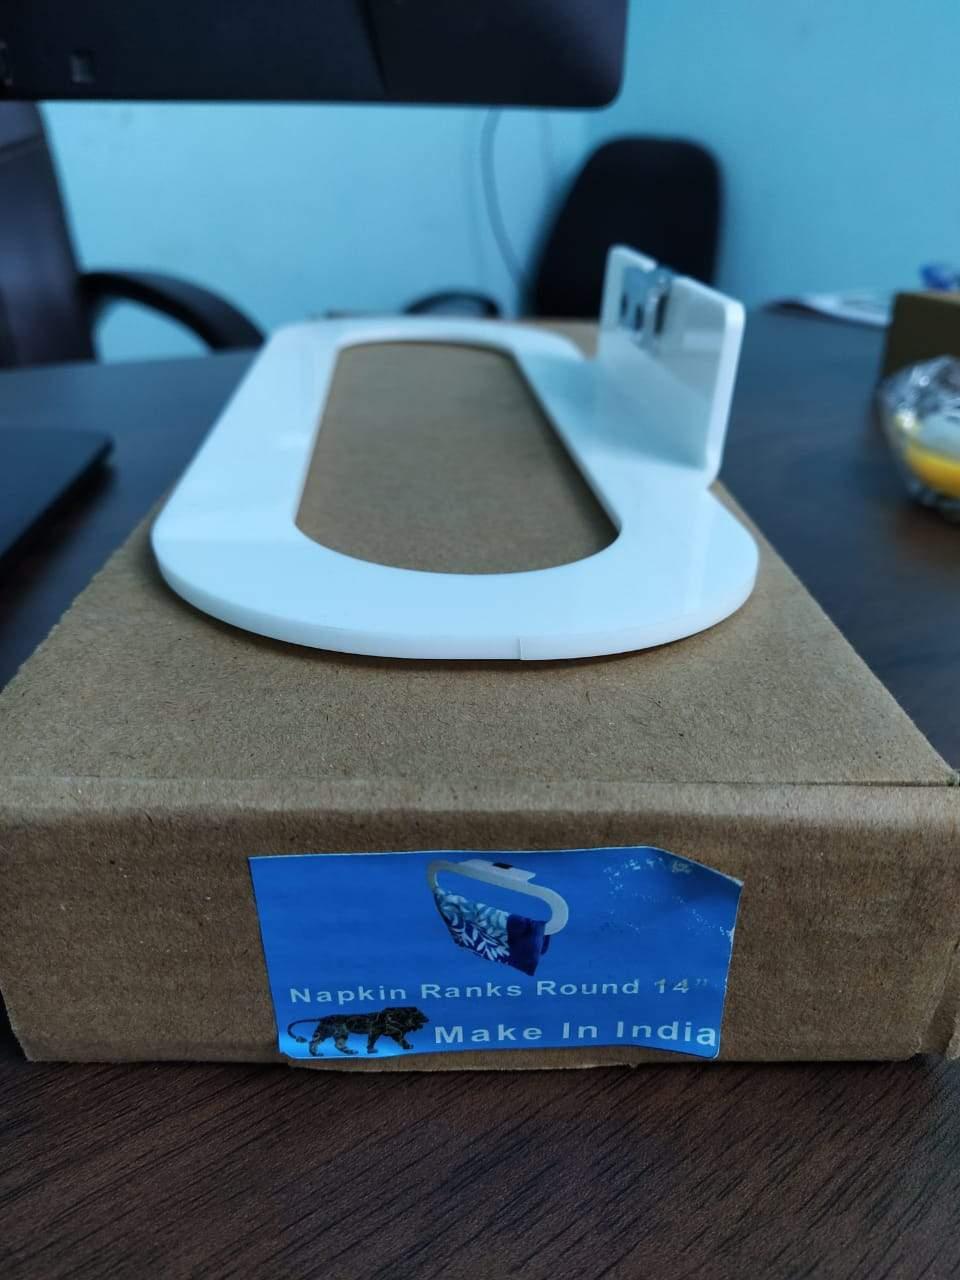 Kitchen/Bathroom Round Napkin Toilet Paper Holder - 14 inch - Unnati Enterprises